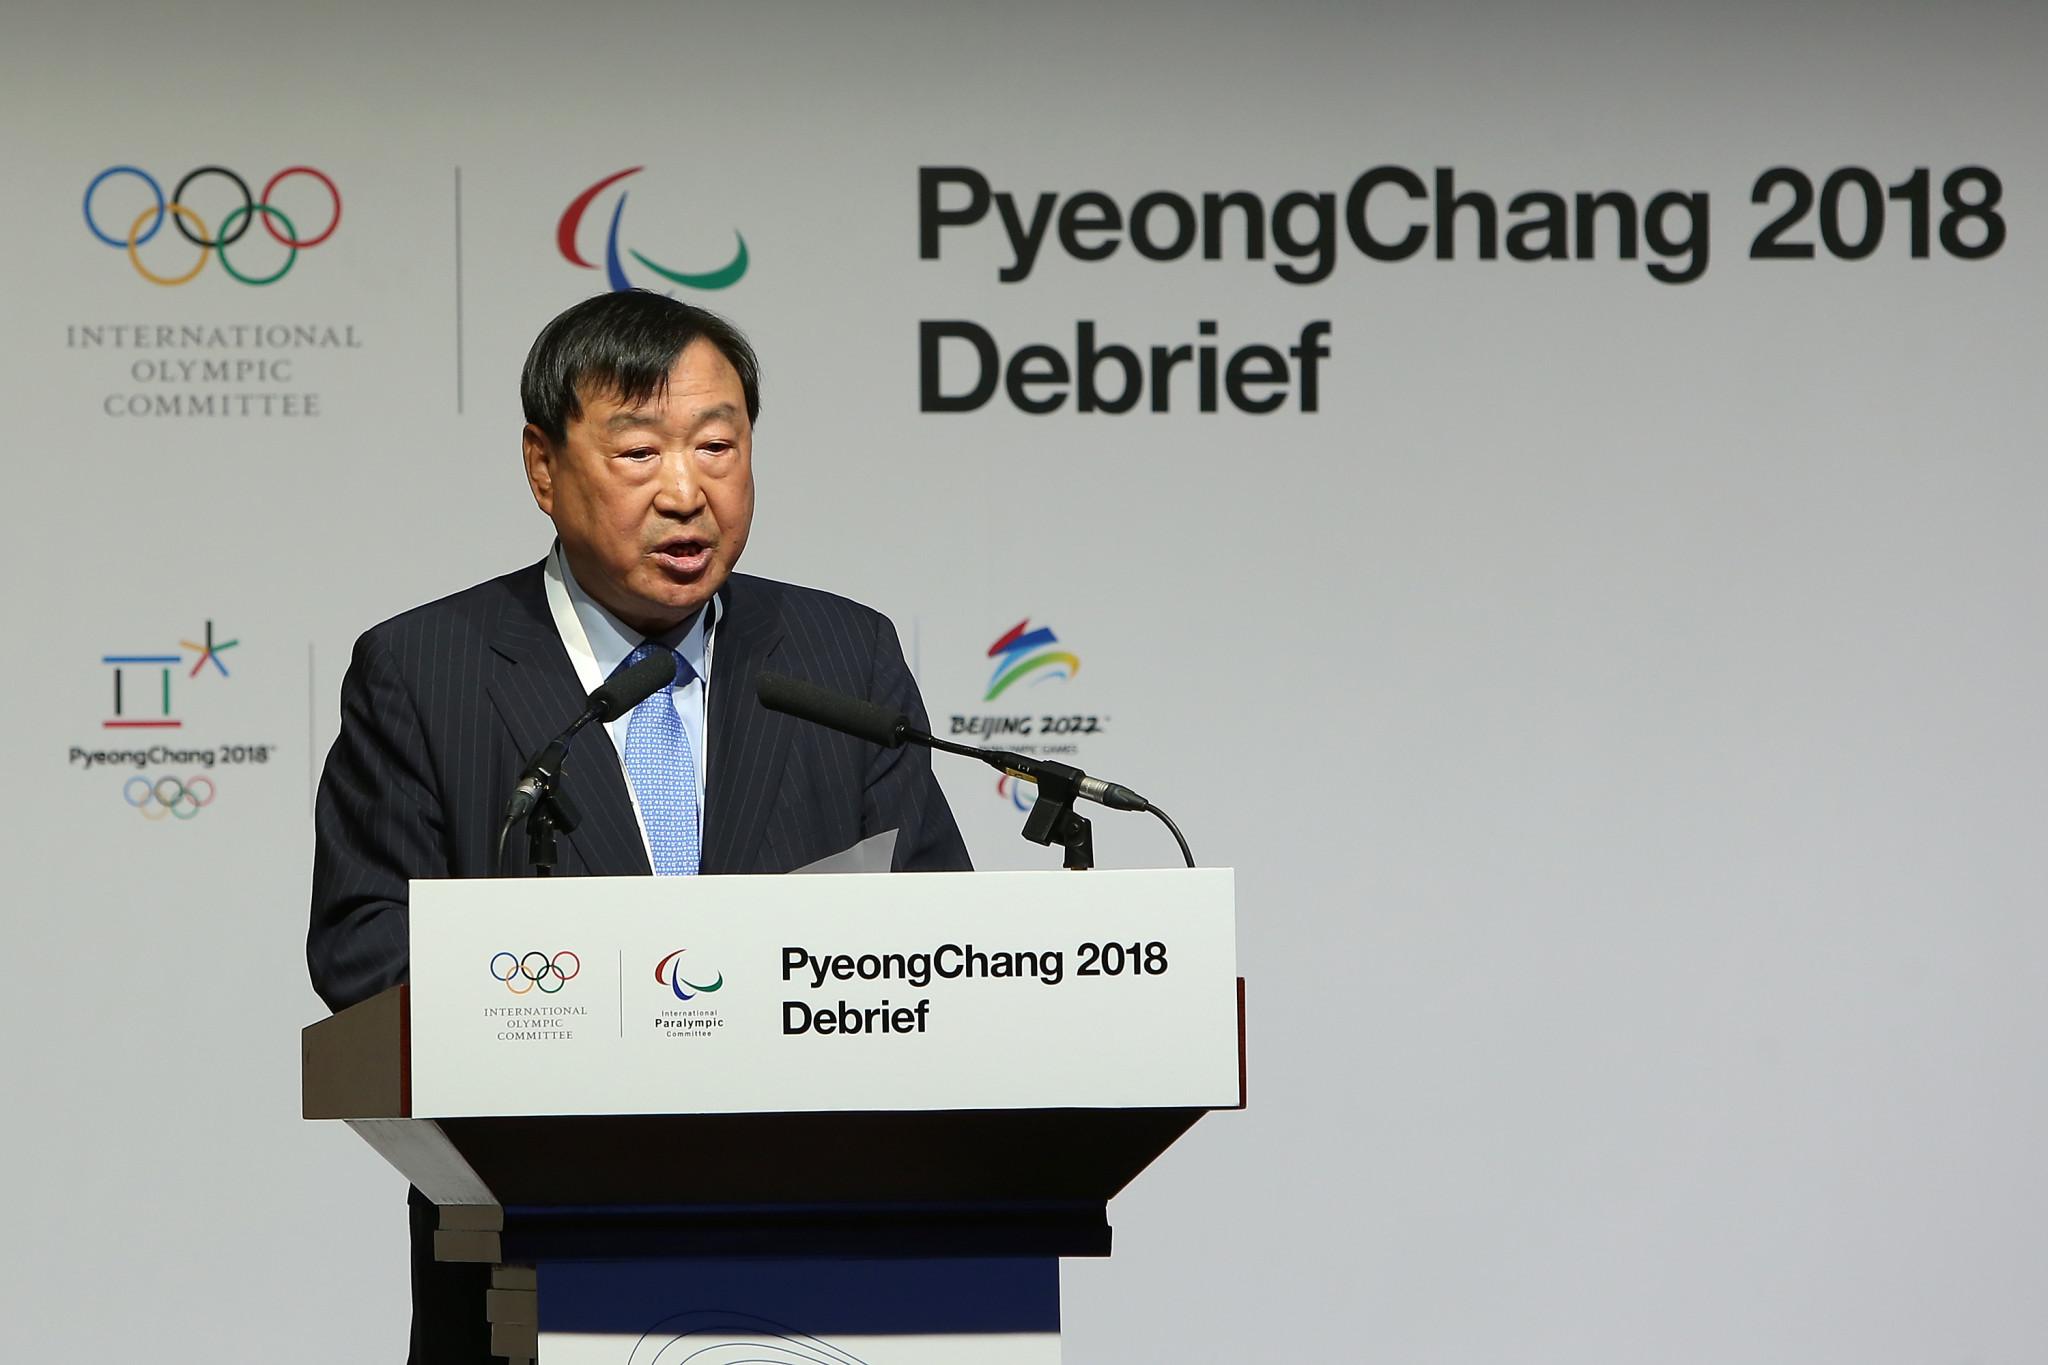 Pyeongchang 2018 President praises Beijing 2022 and predicts profitable Winter Olympics